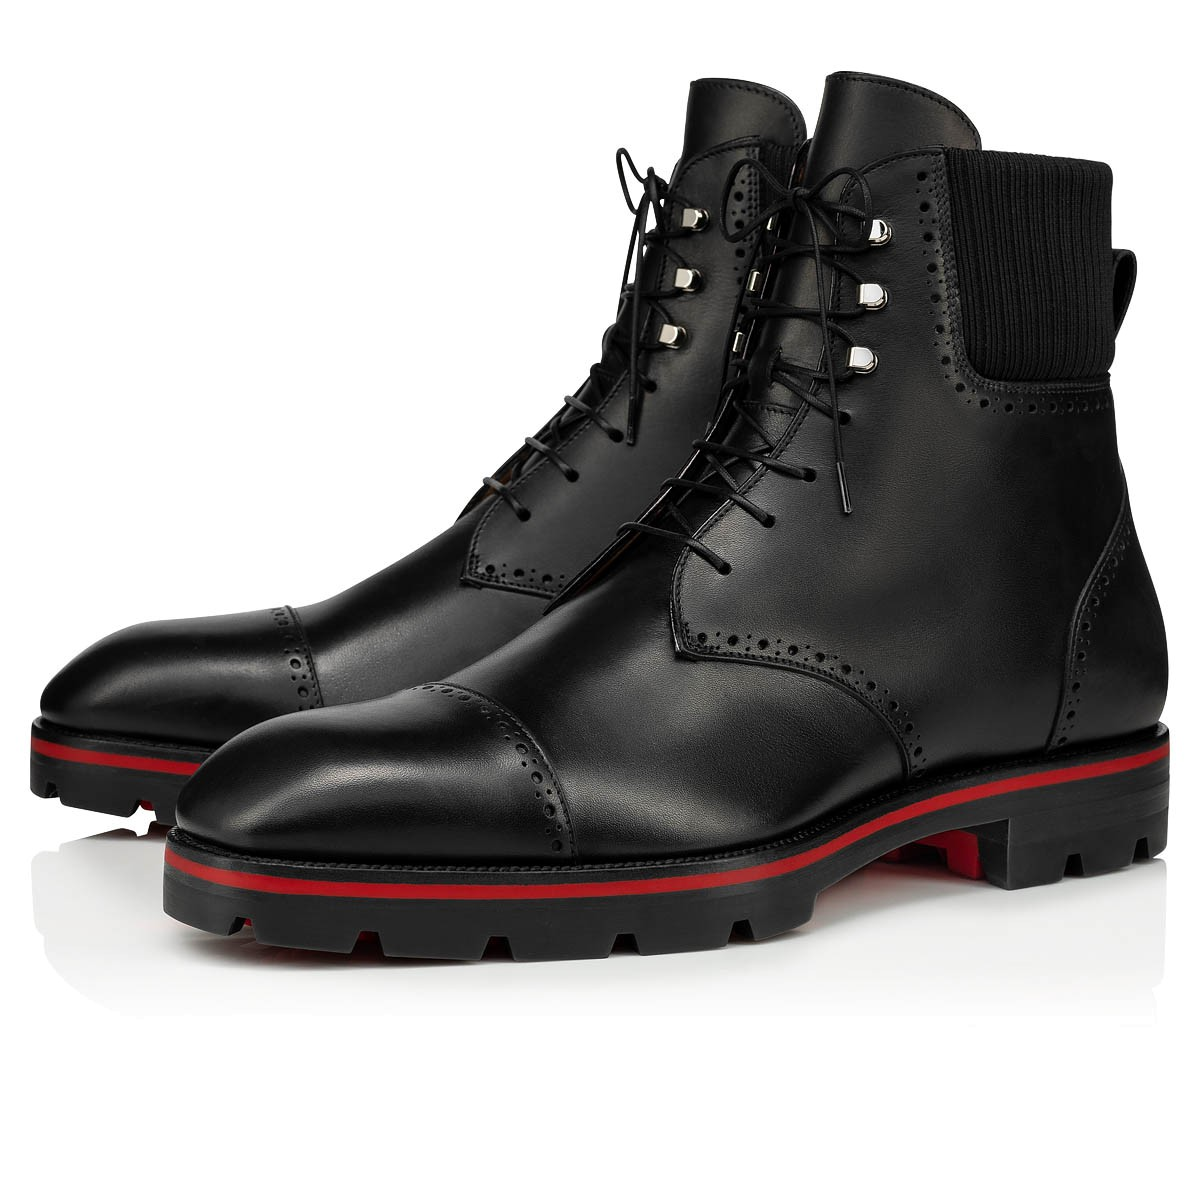 Shoes - Citycroc - Christian Louboutin